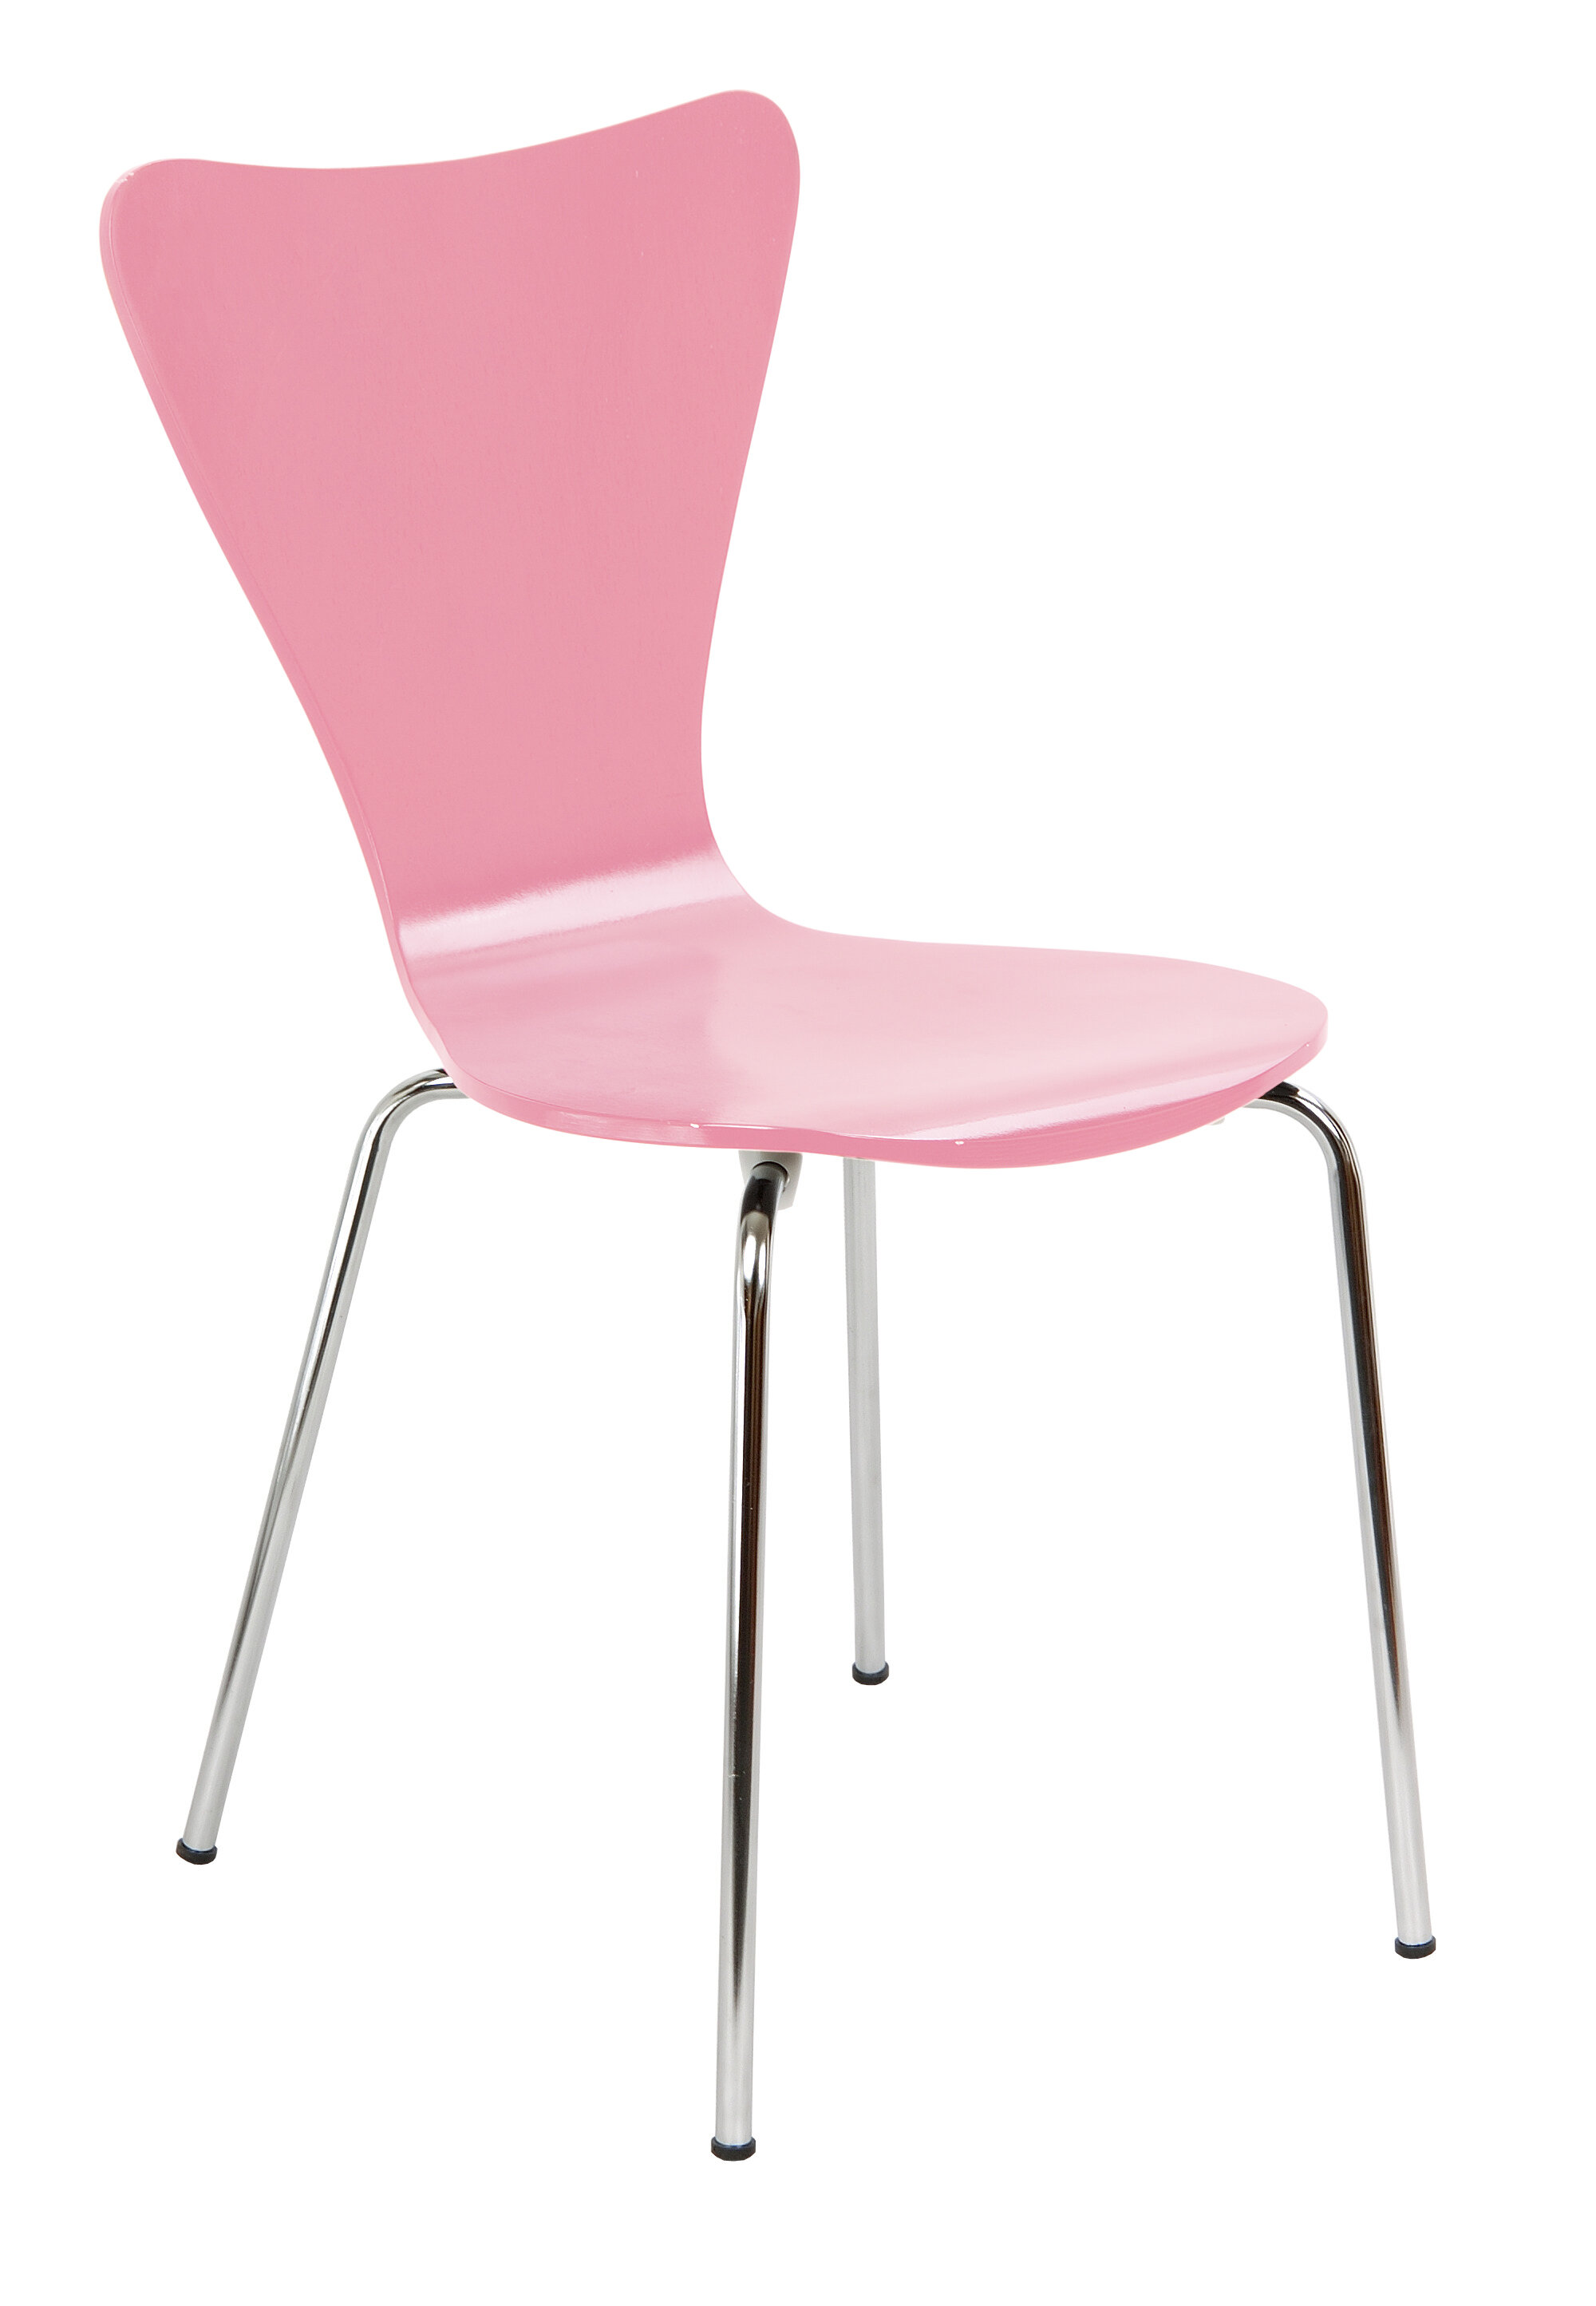 Remarkable Willette Kids Chair Dailytribune Chair Design For Home Dailytribuneorg